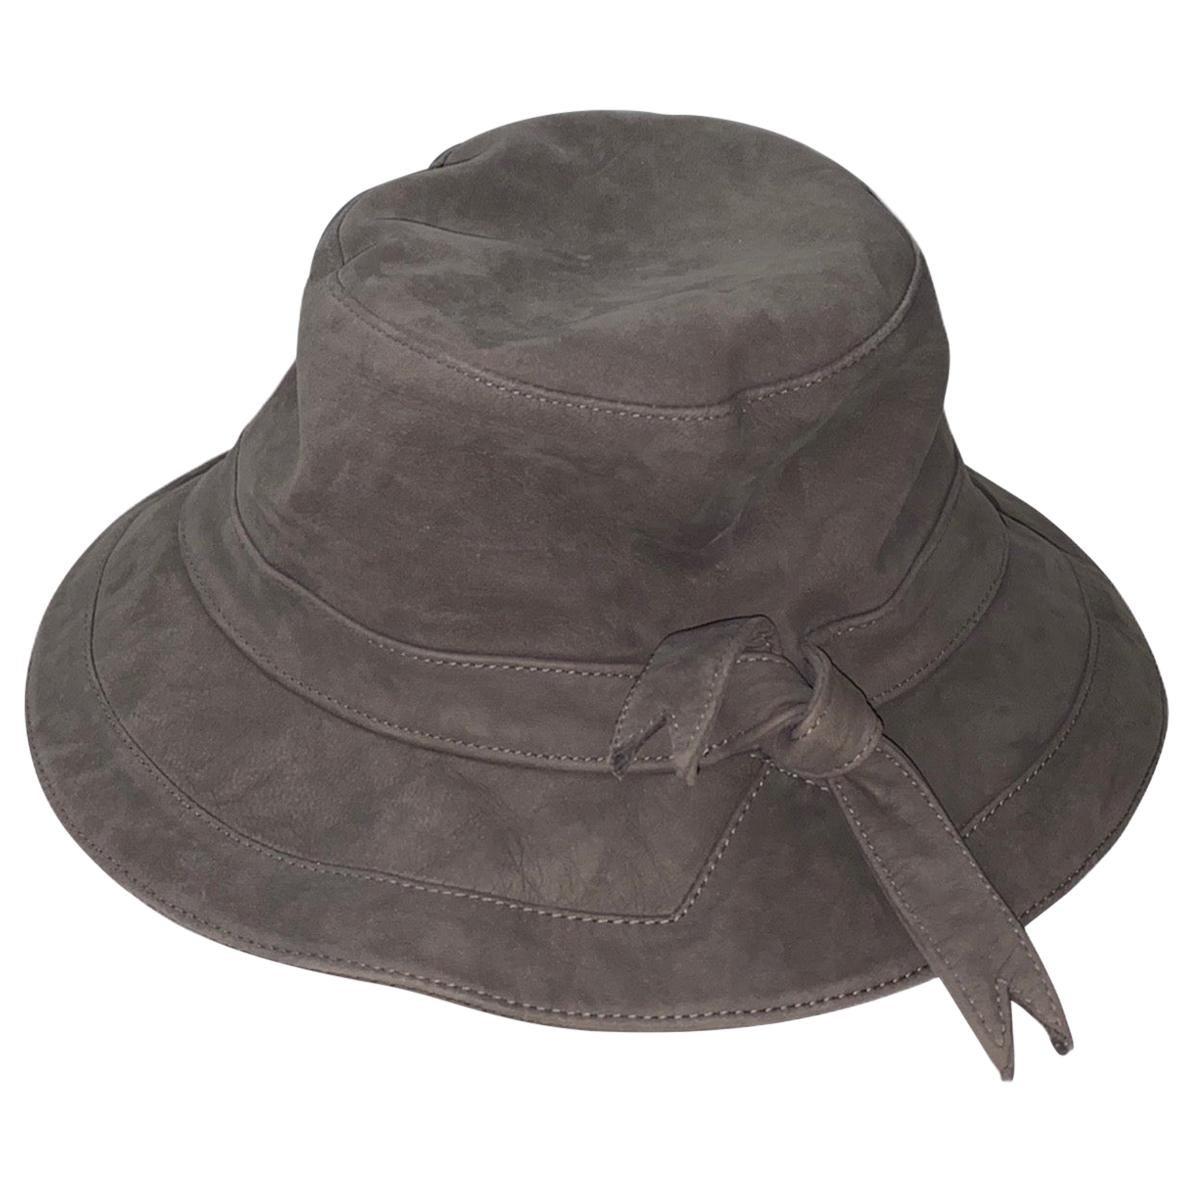 Stunning HERMES Paris Suede Leather Hat Cap